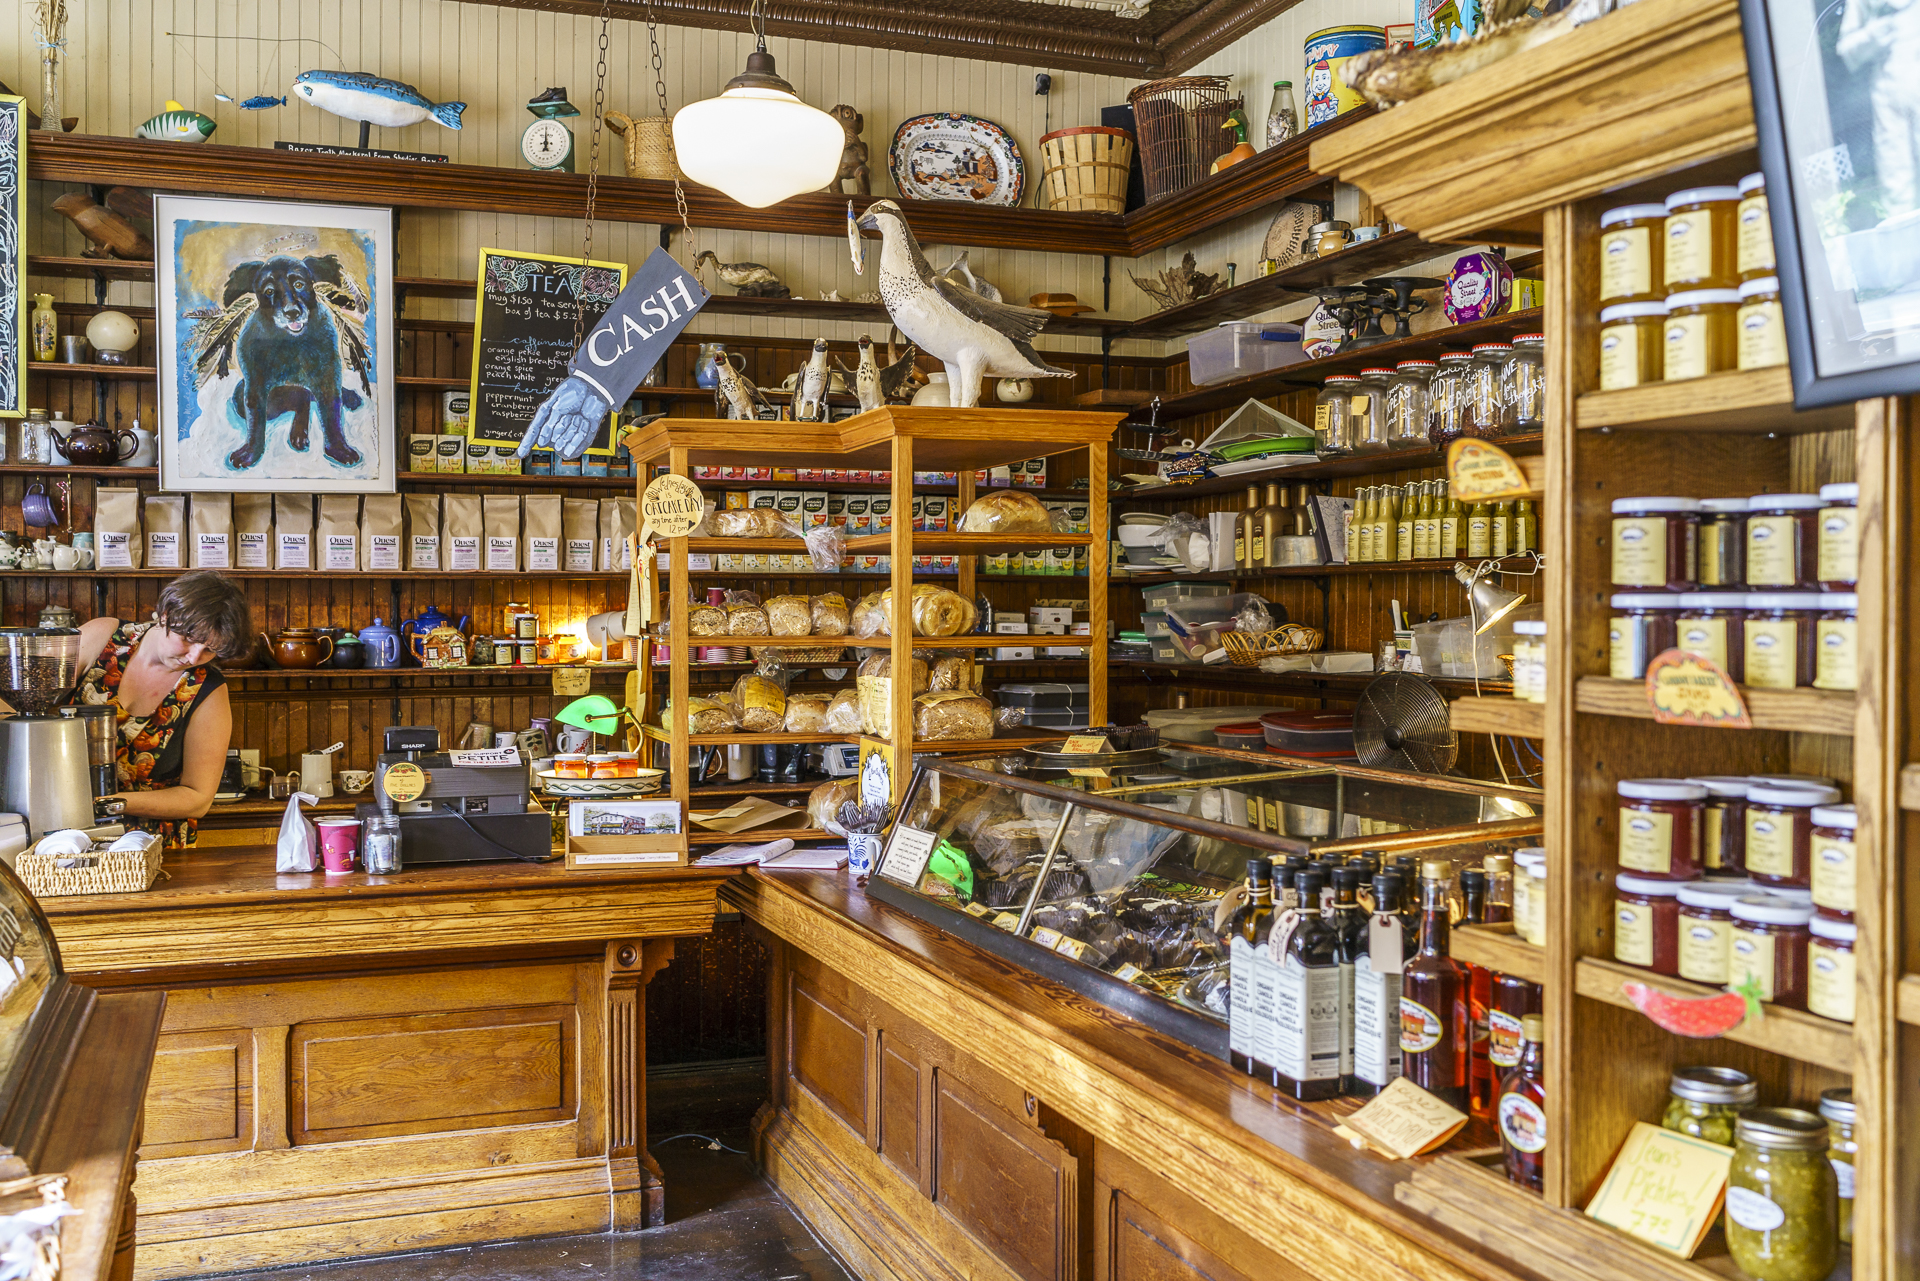 LeHave Bakery